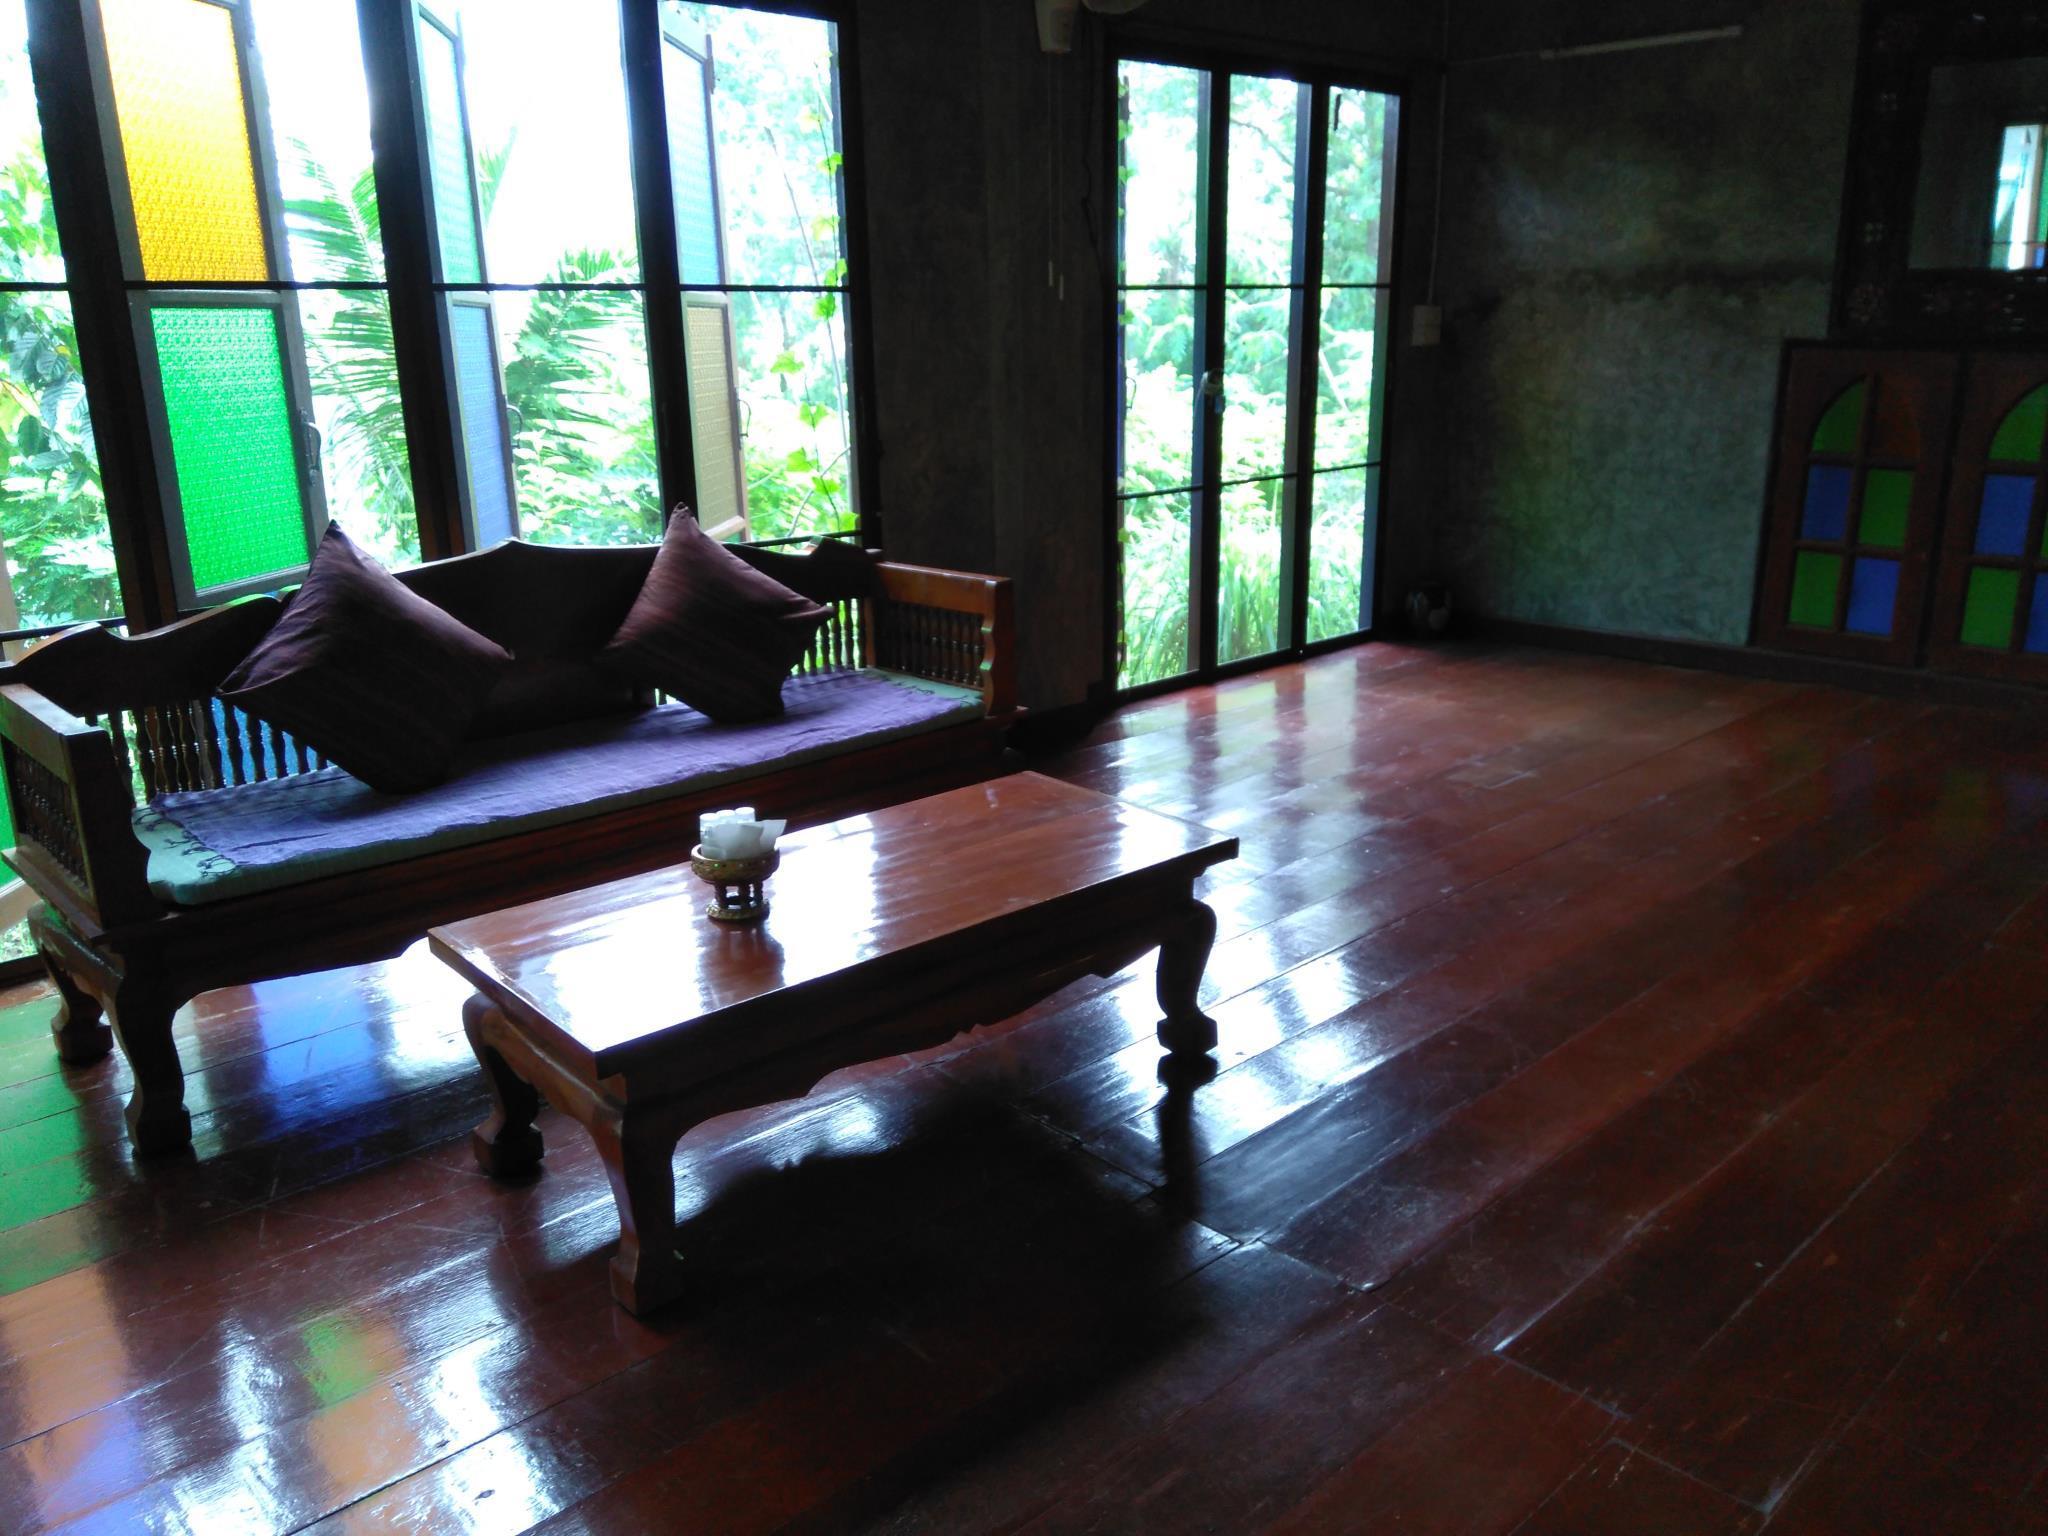 Review Pimprajan Homestay (Apussara Home)